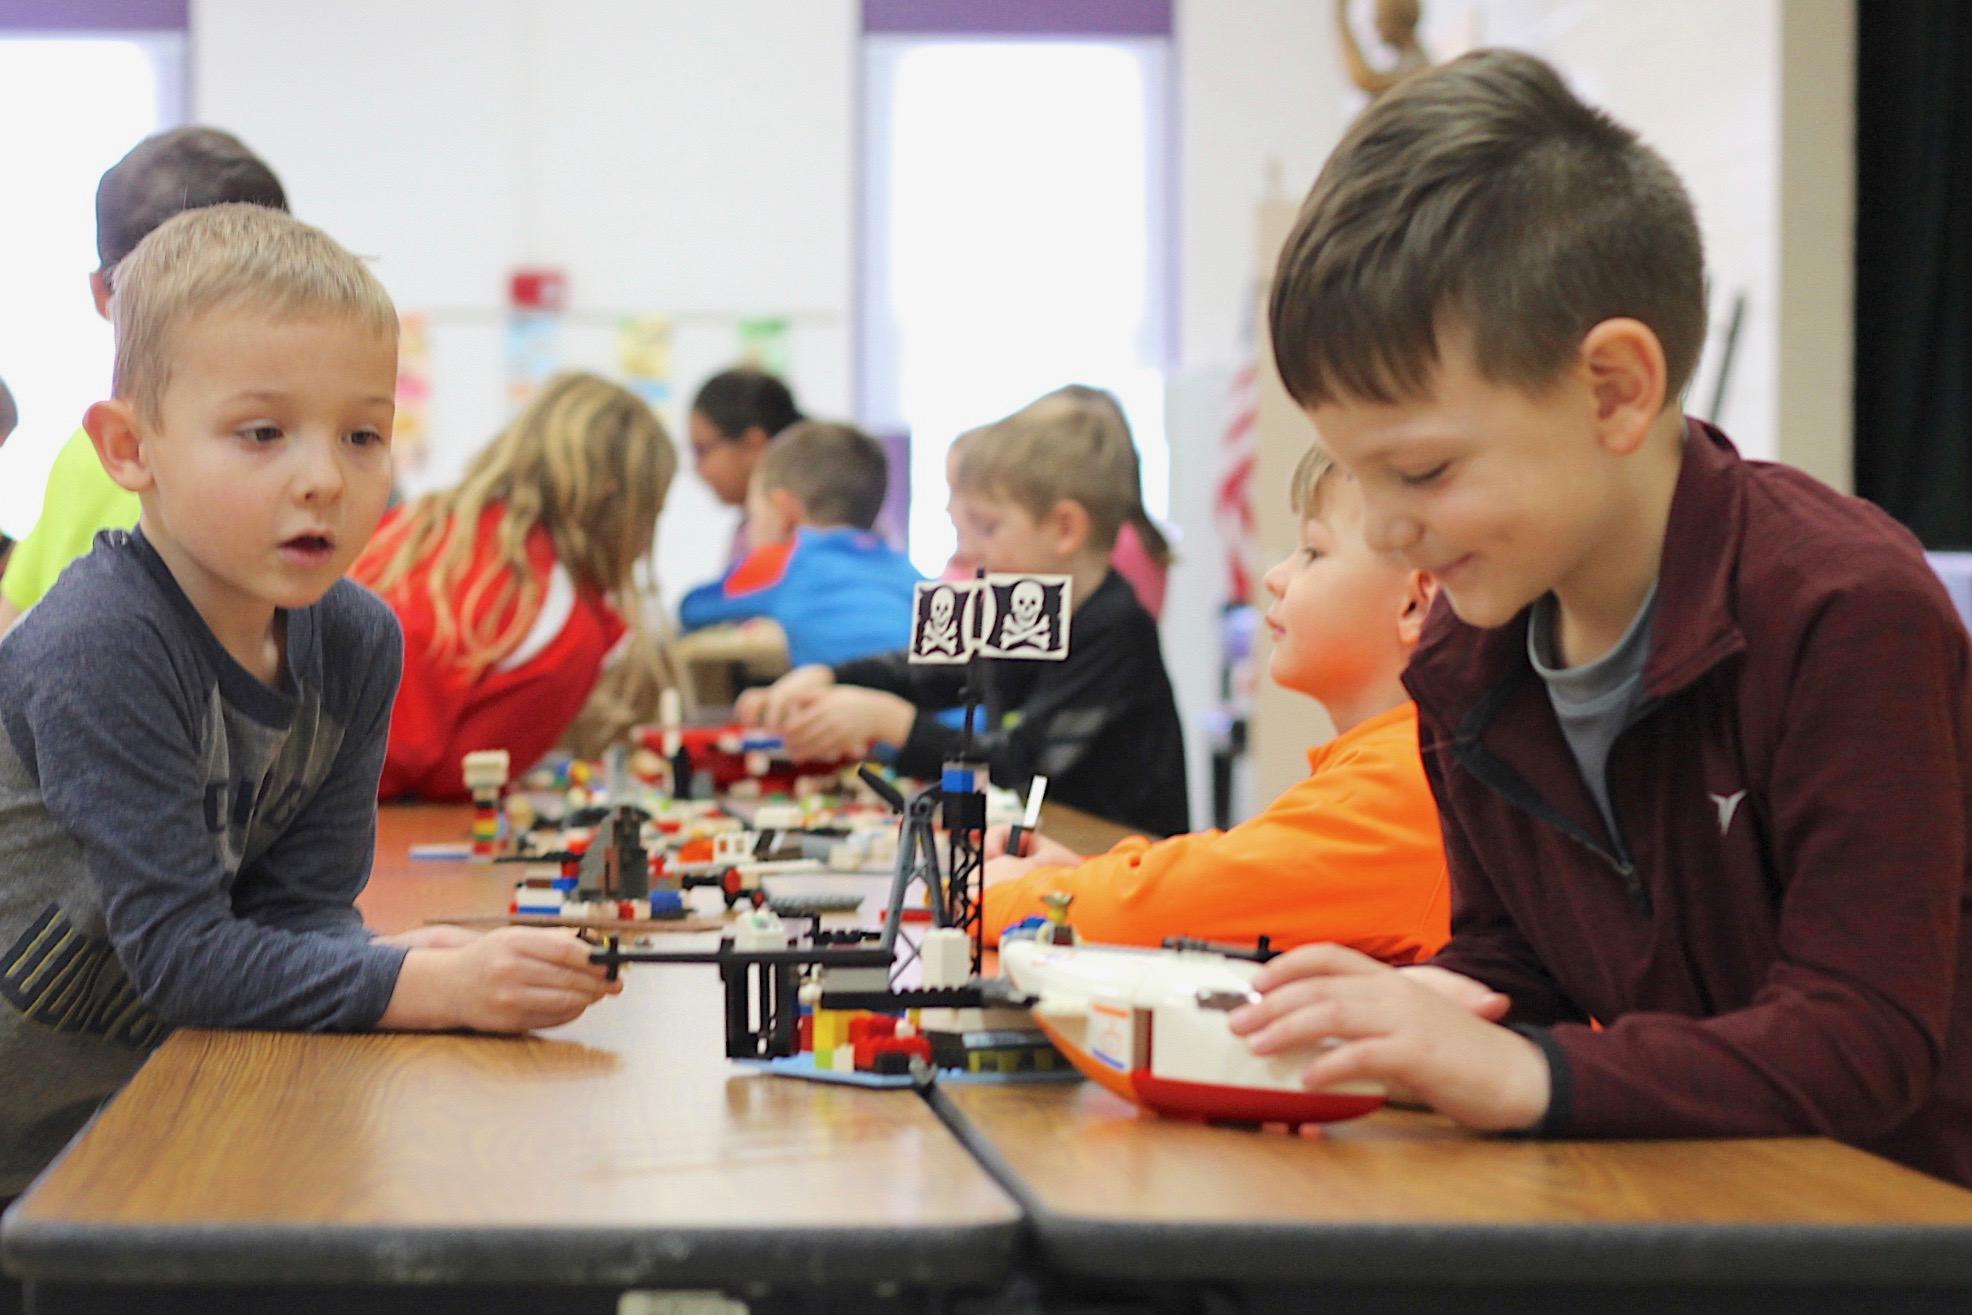 Mobile Lab - Innovation Stations Lego boys playing.jpg